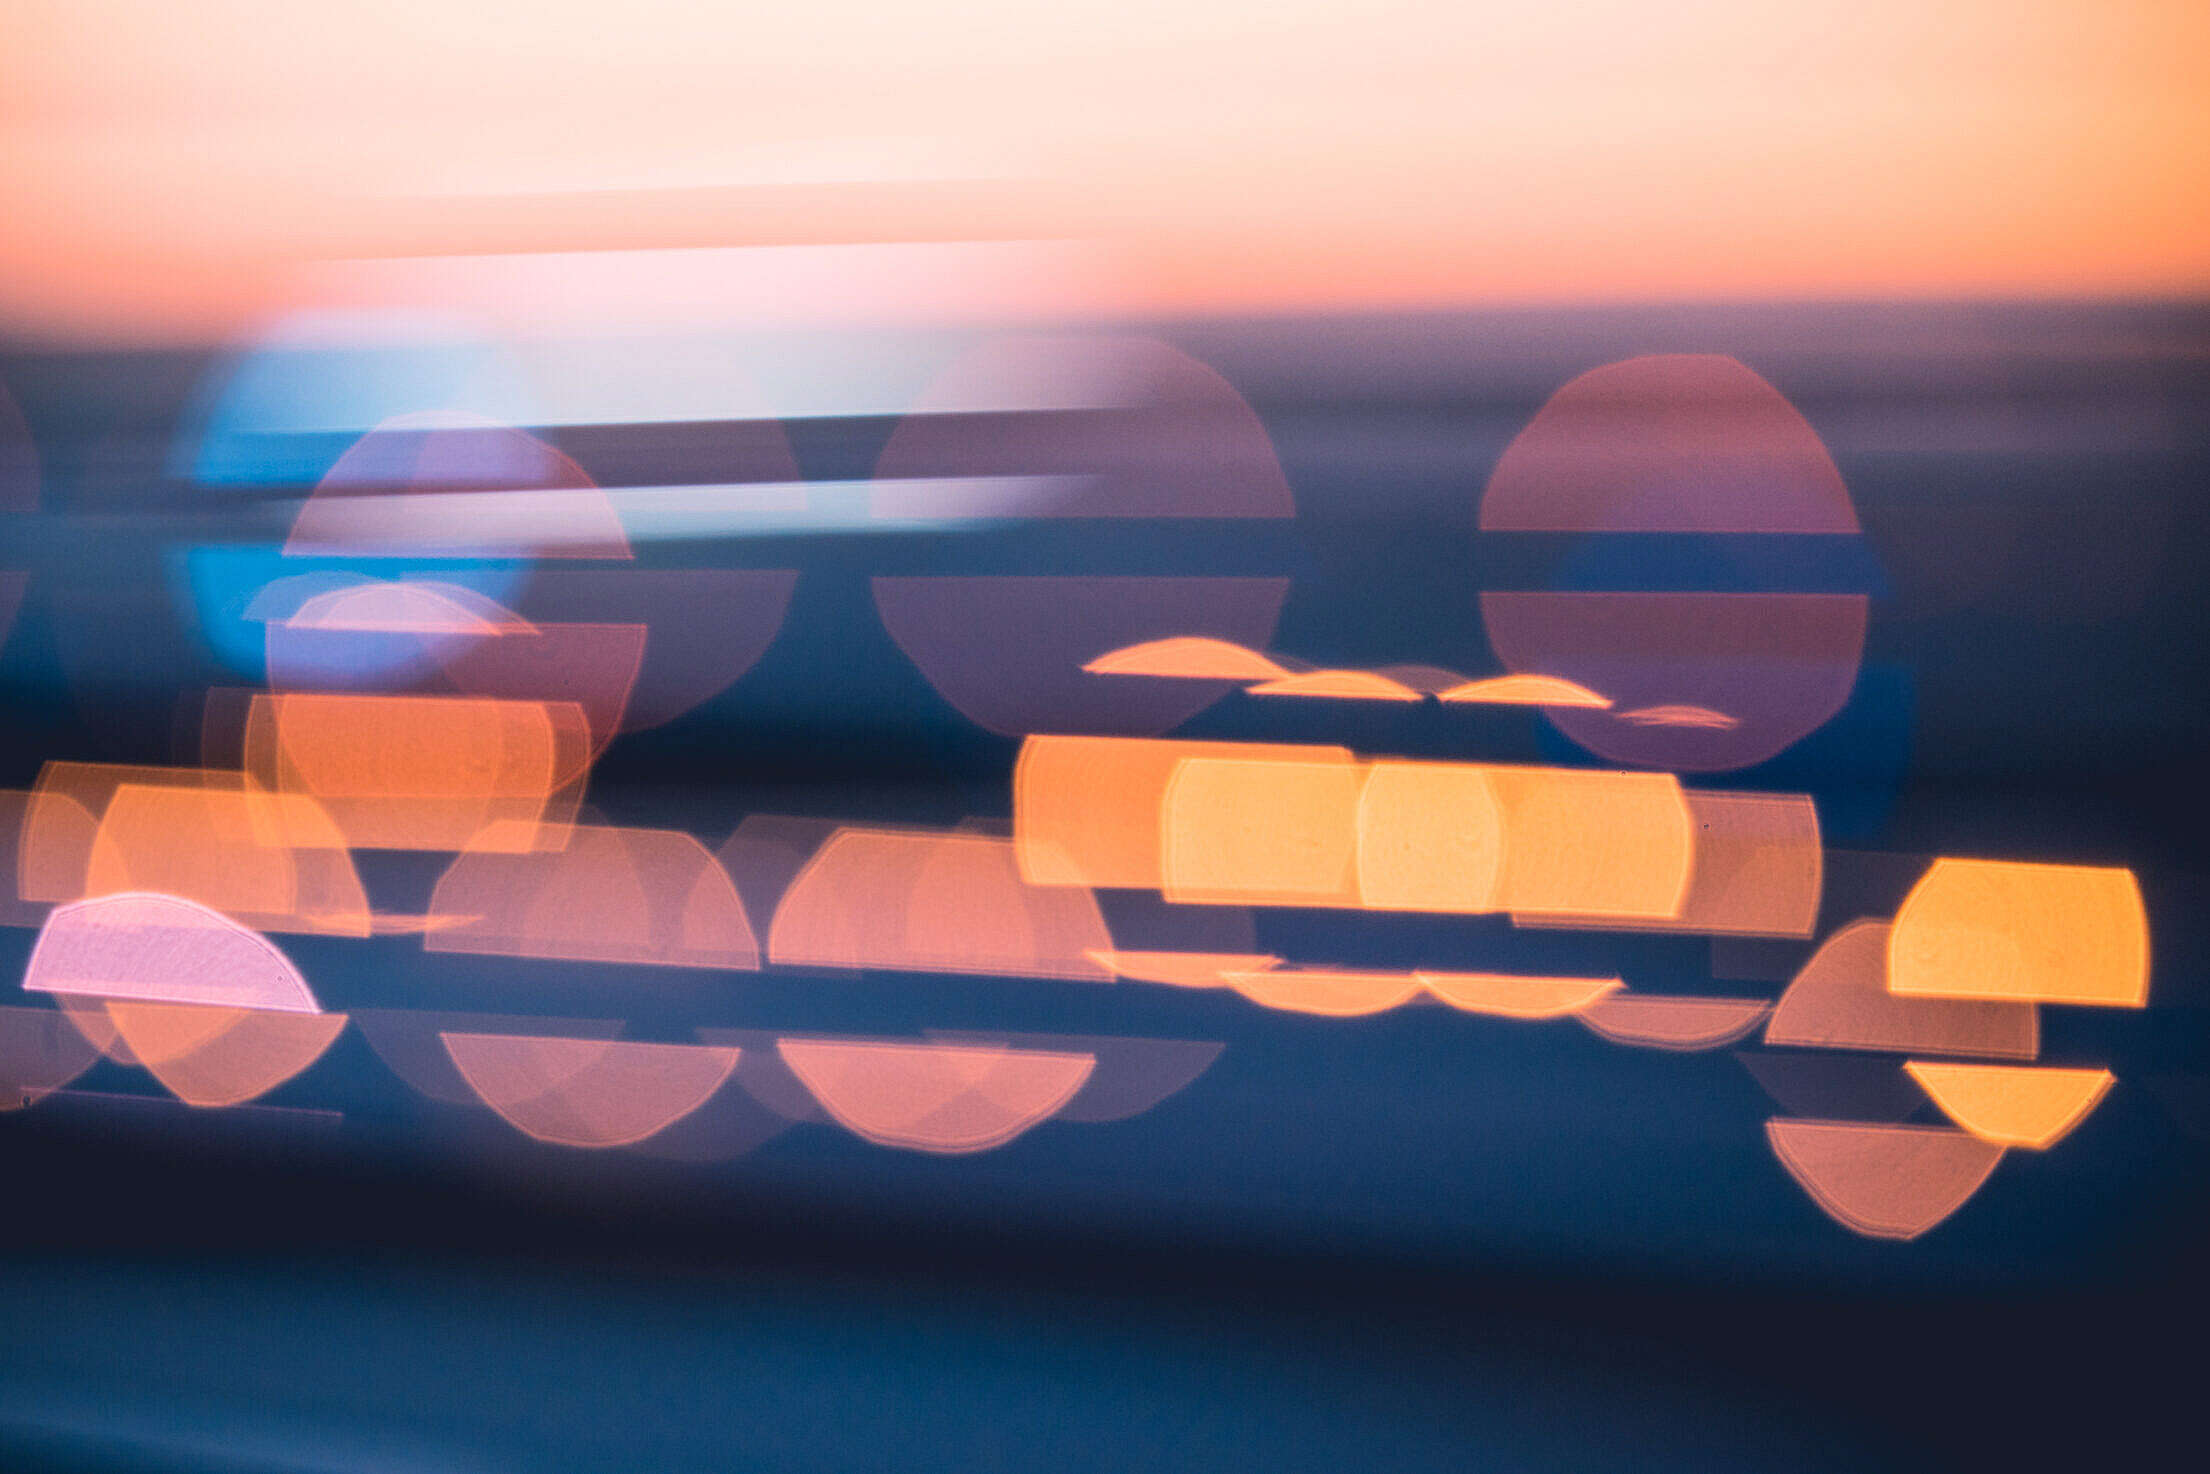 Evening Sunset Abstract Blue City Lights Bokeh Free Stock Photo